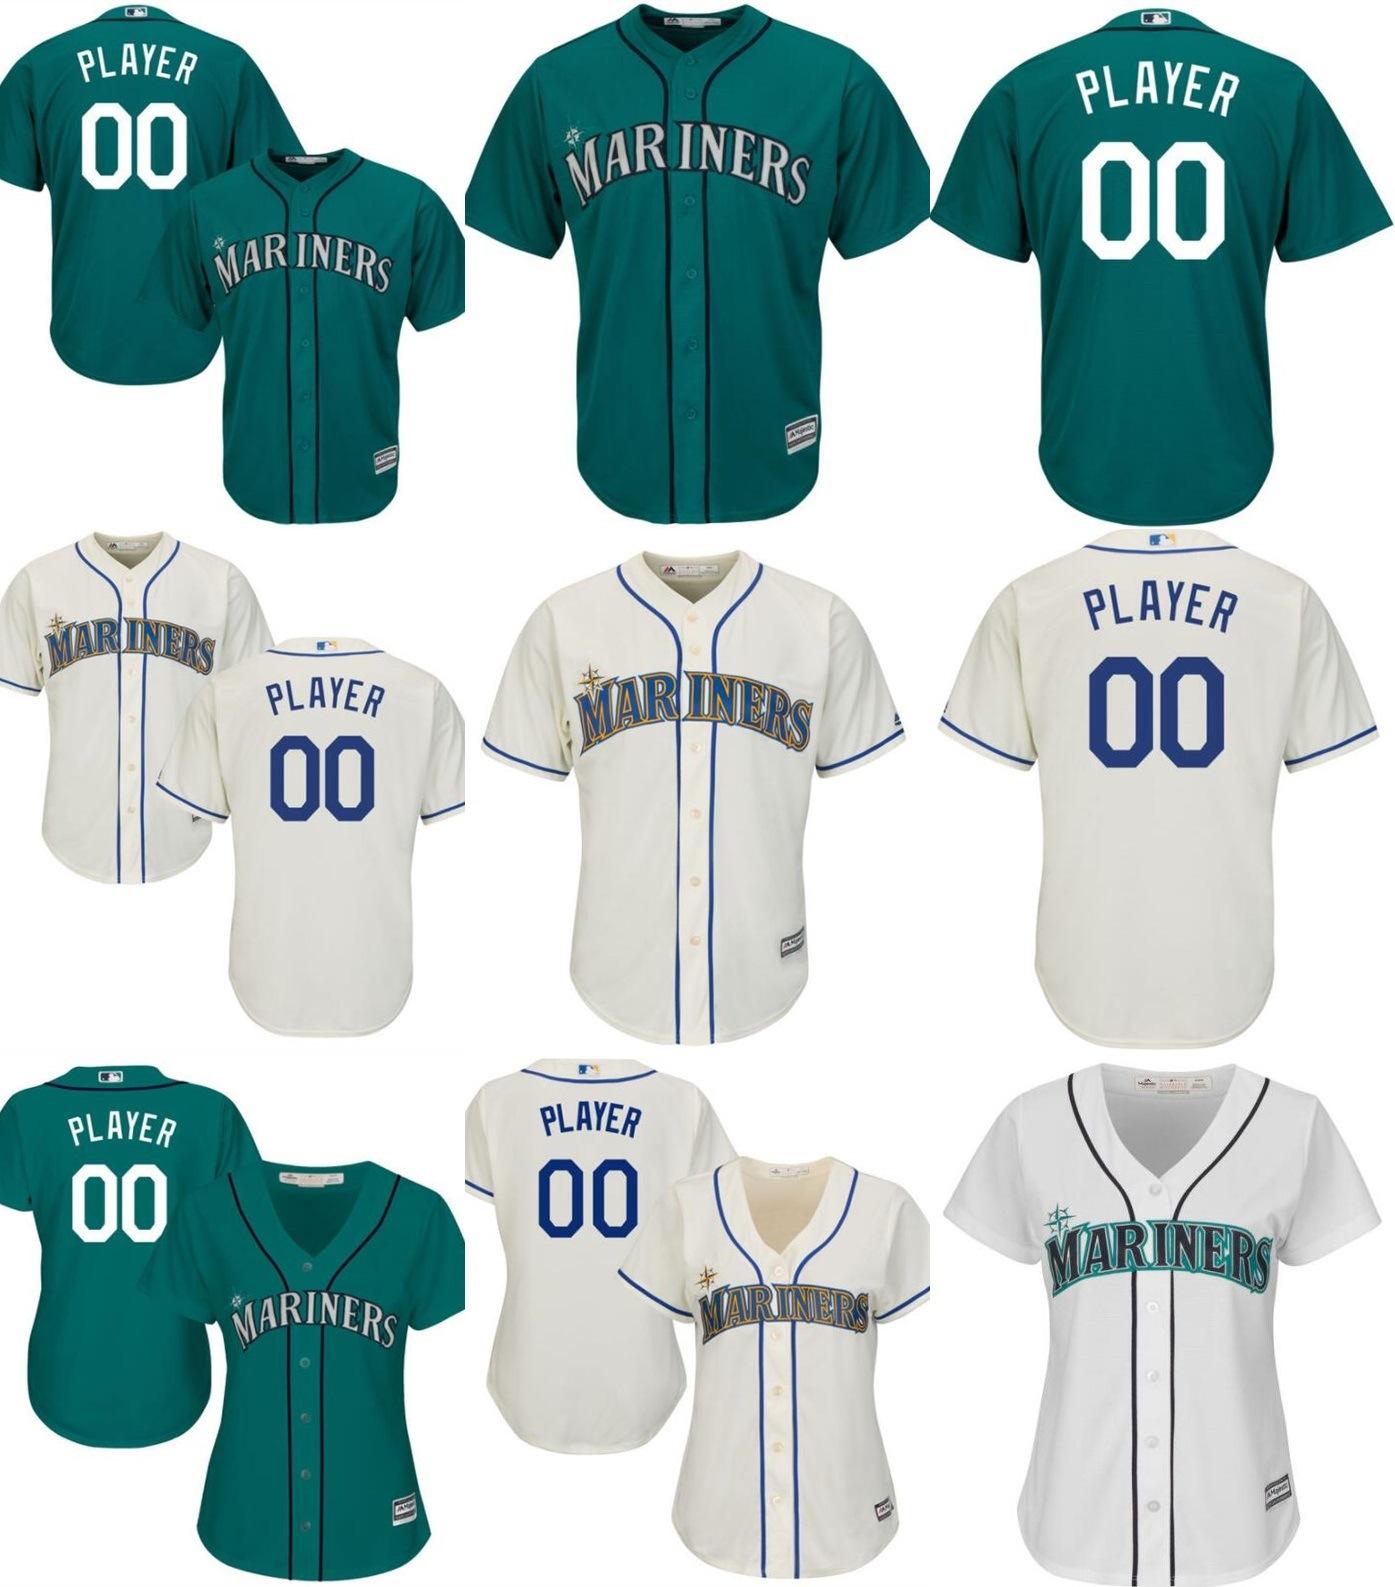 quality design 00edd 28222 [Hot Item] Customized Men Women Kids Seattle Mariners Baseball Jerseys